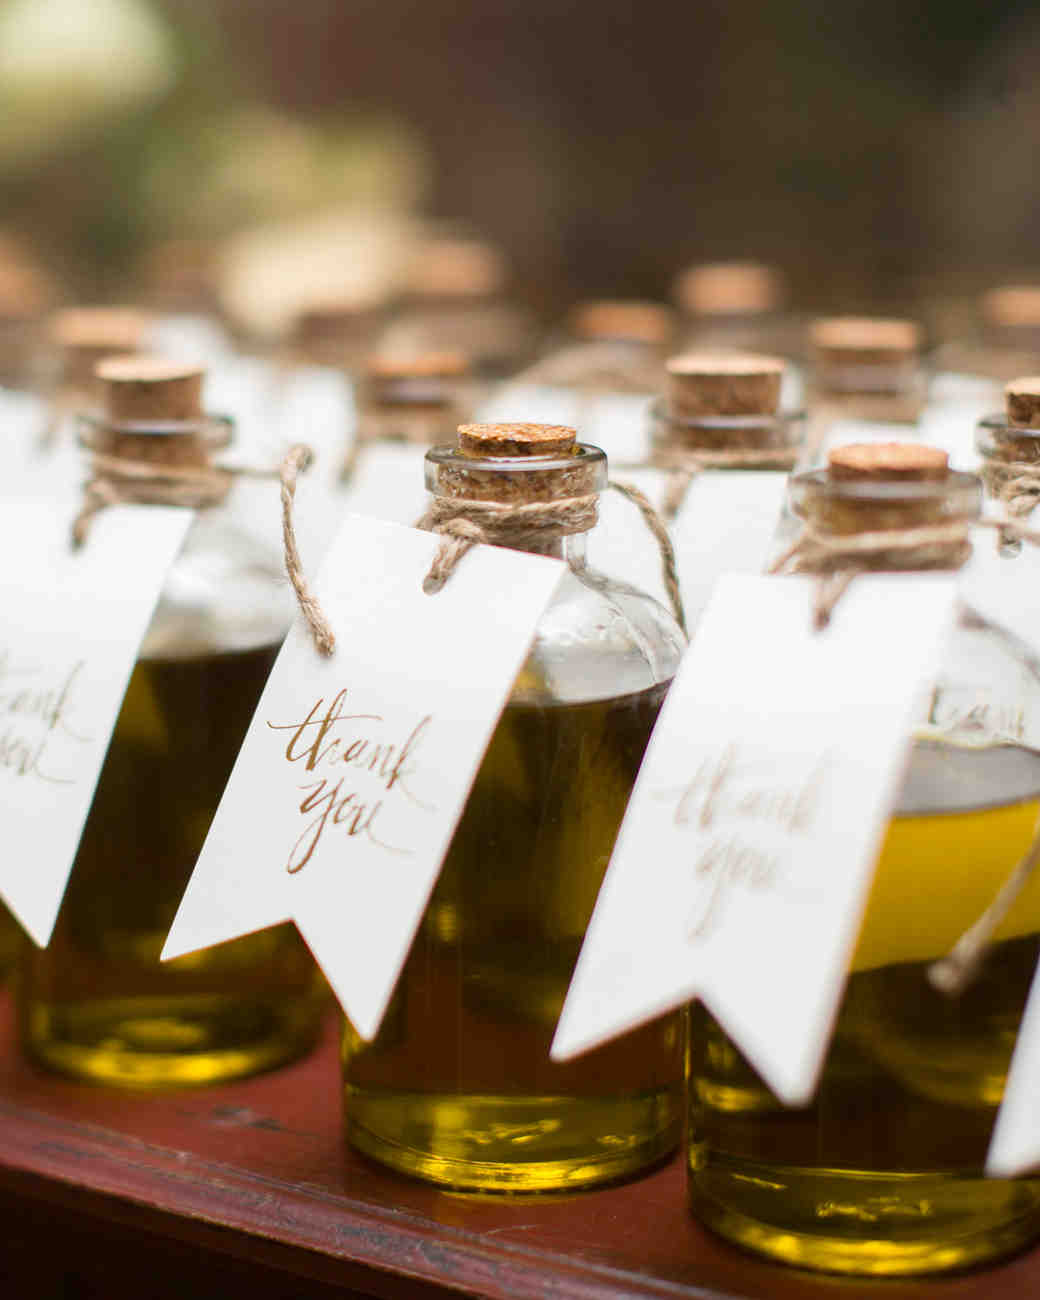 briana-adam-wedding-oil-1312-s112471-1215.jpg